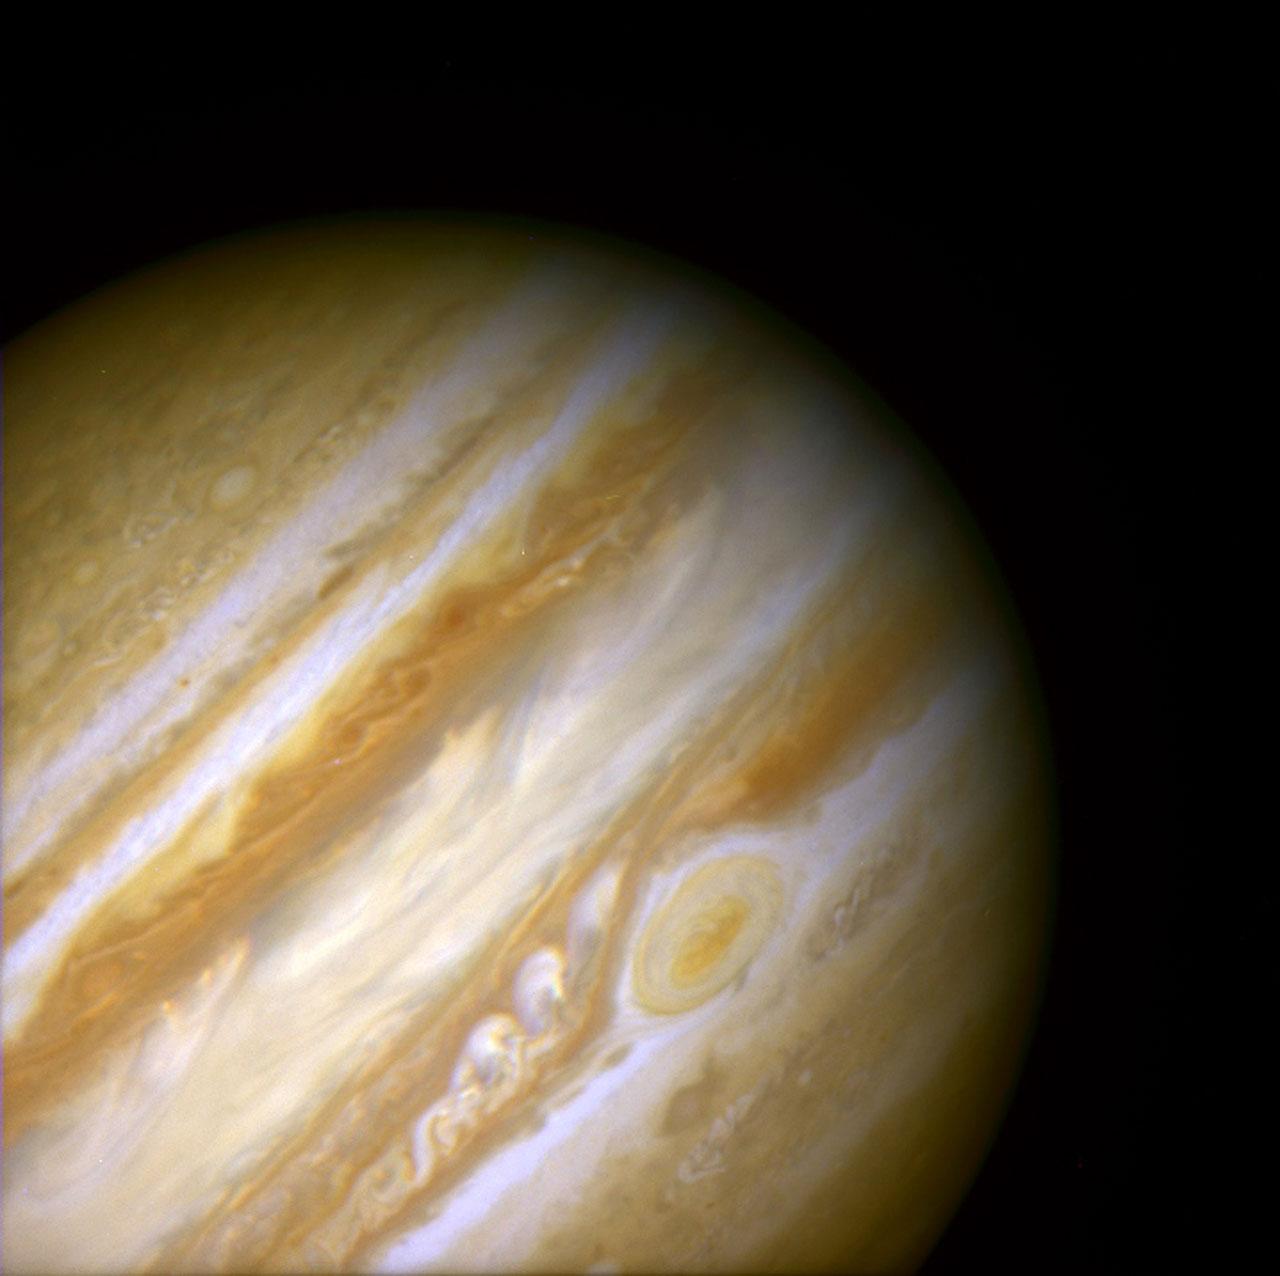 jupiter planet red spot - photo #11